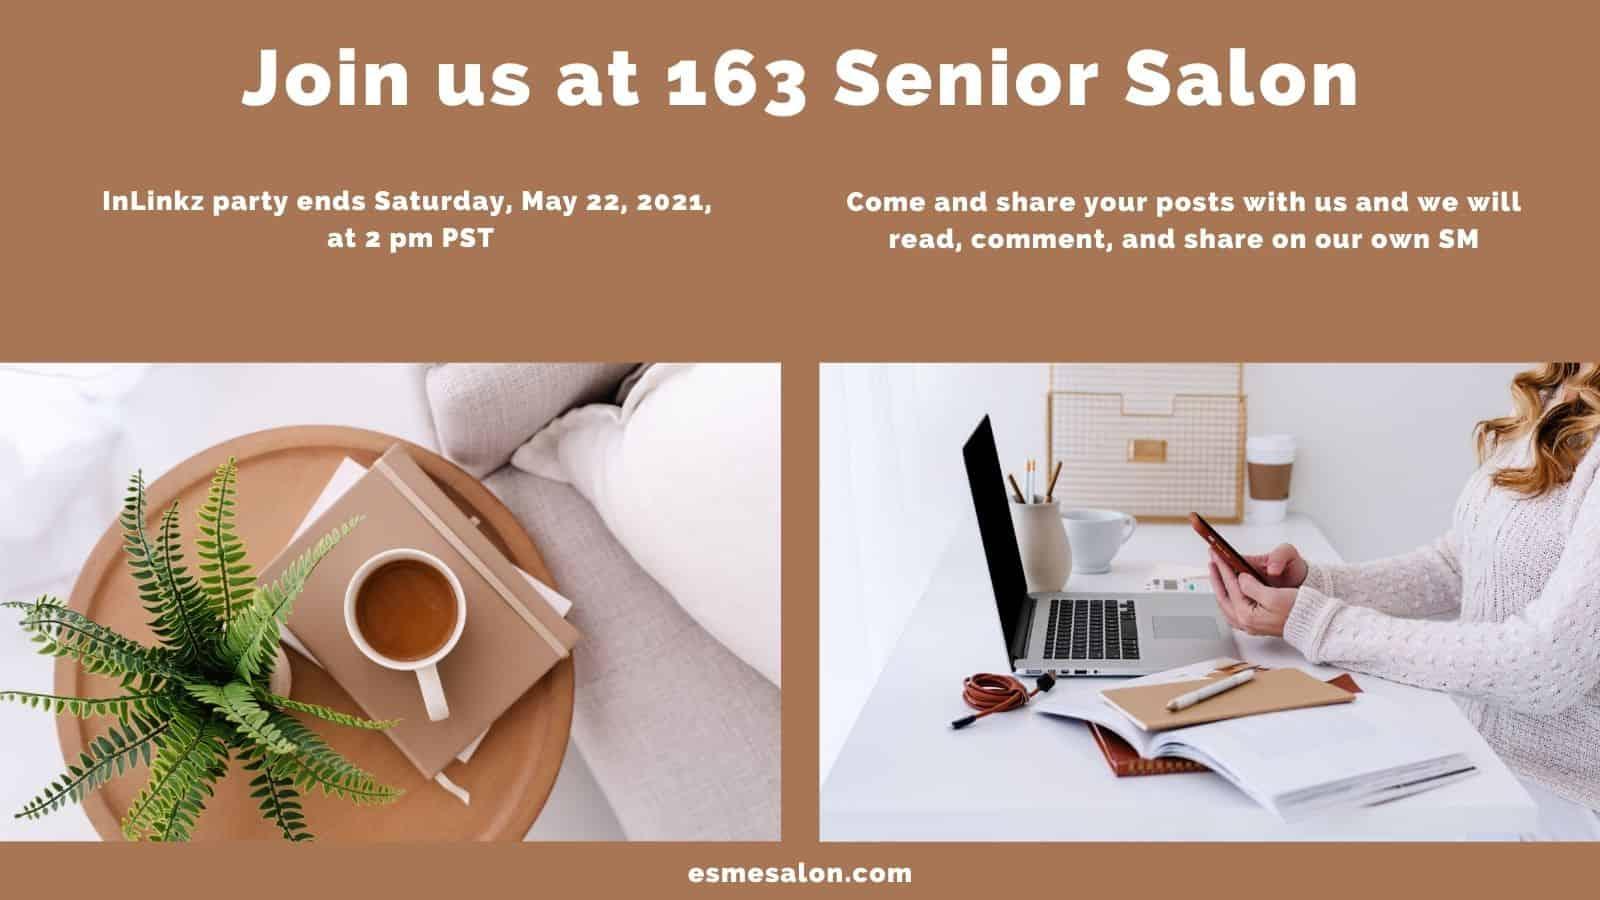 Join us at 163 Senior Salon